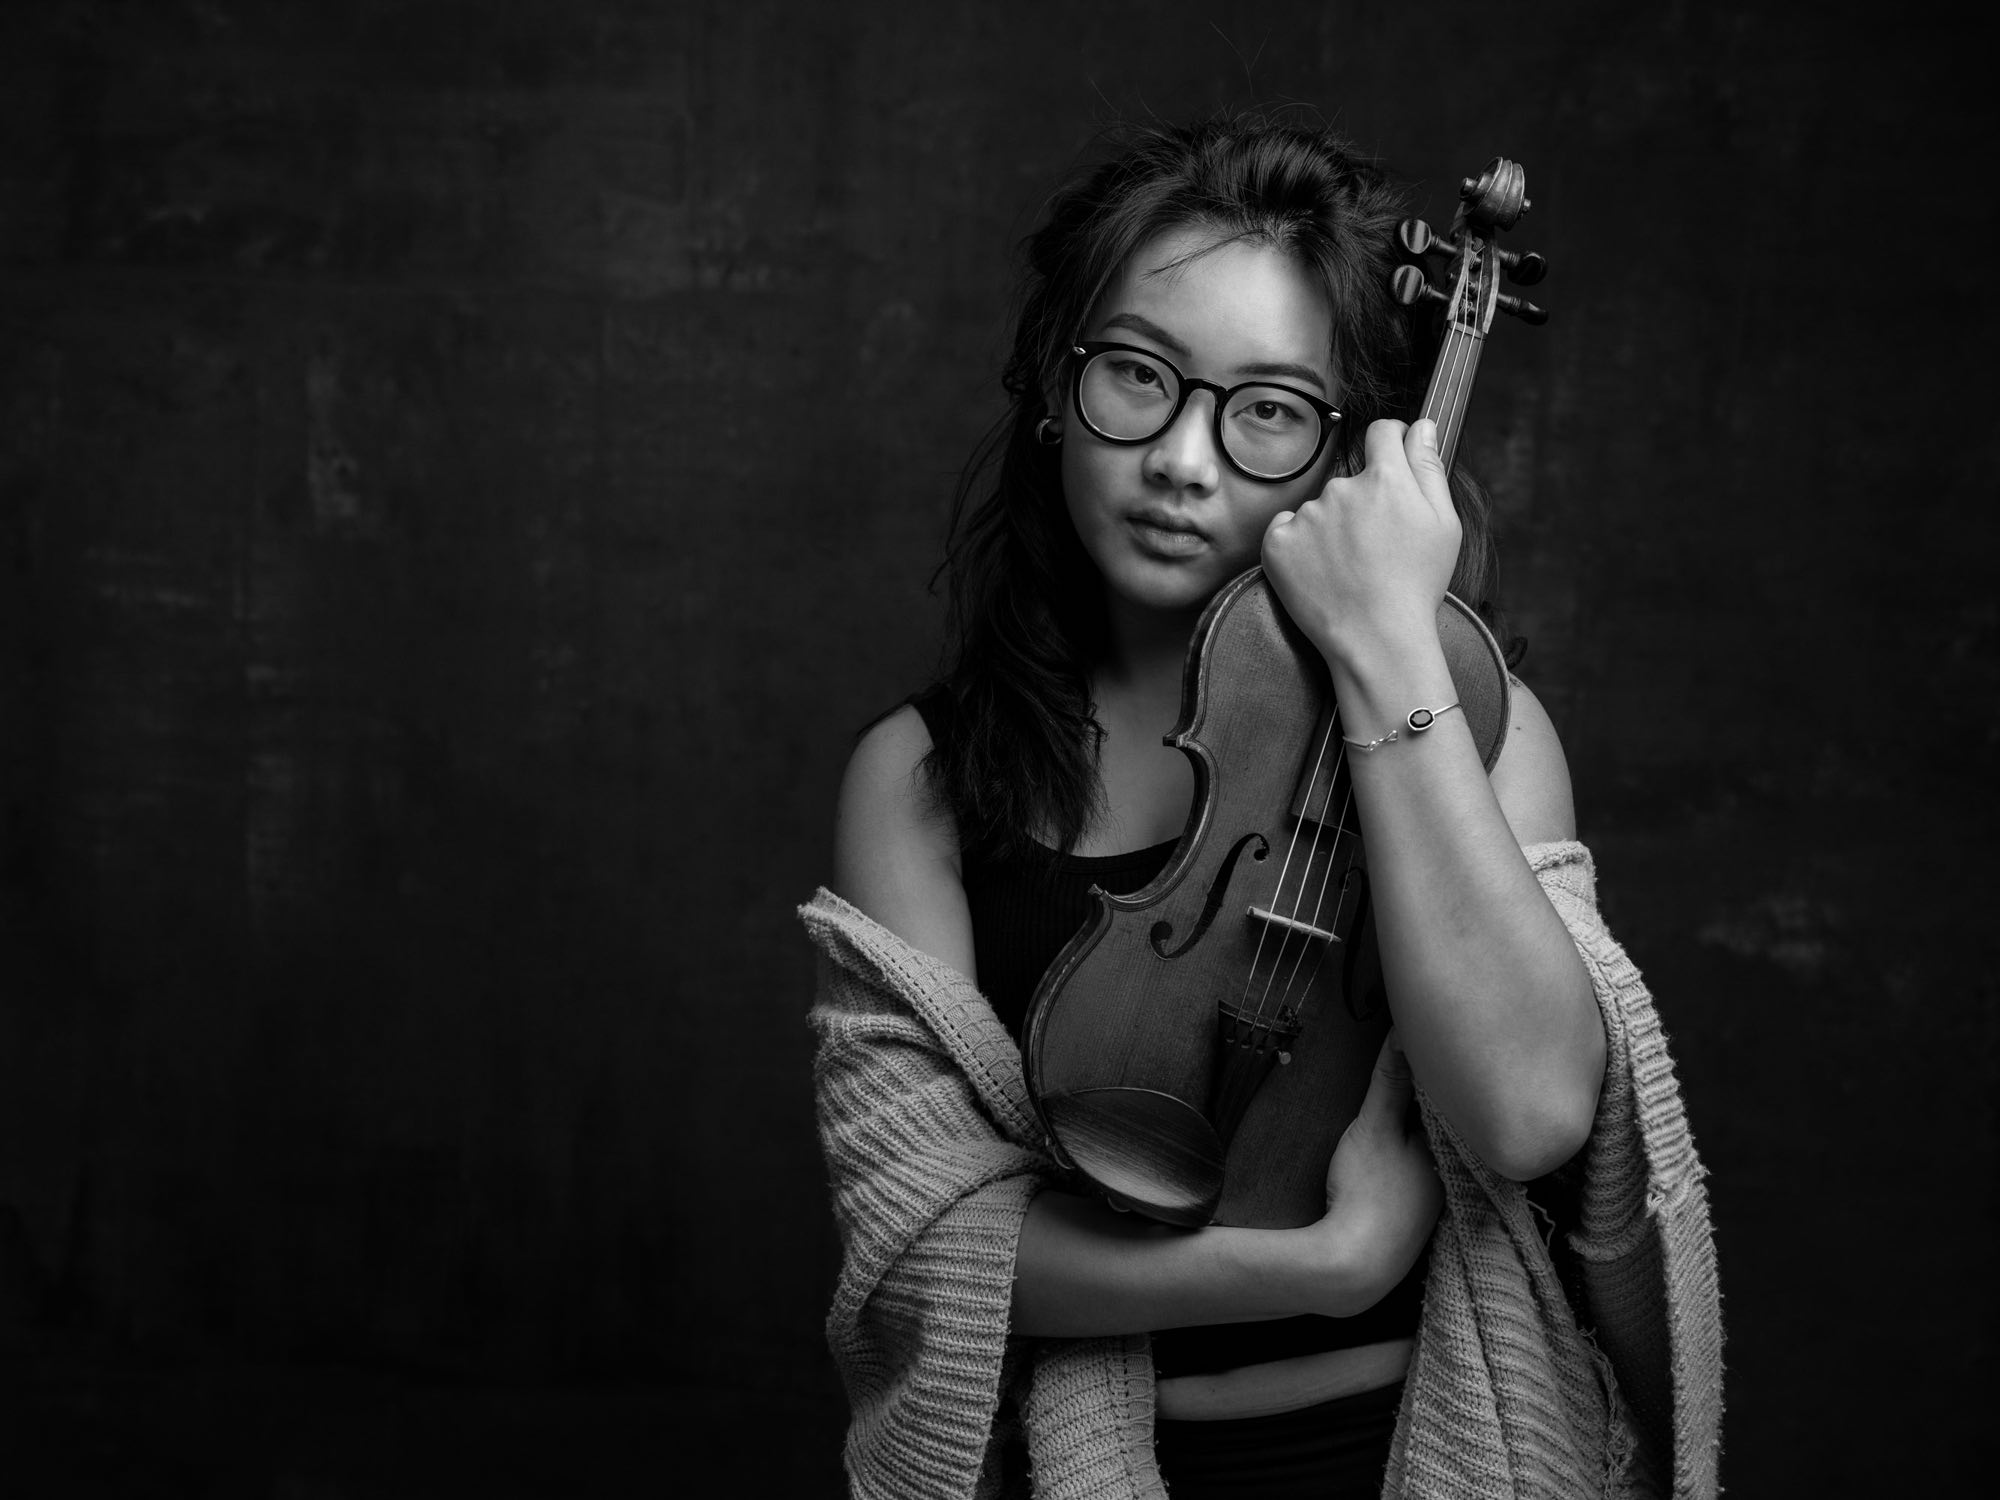 Portrait Photography Violin Singapore Coco Creative Studio-1-3-3